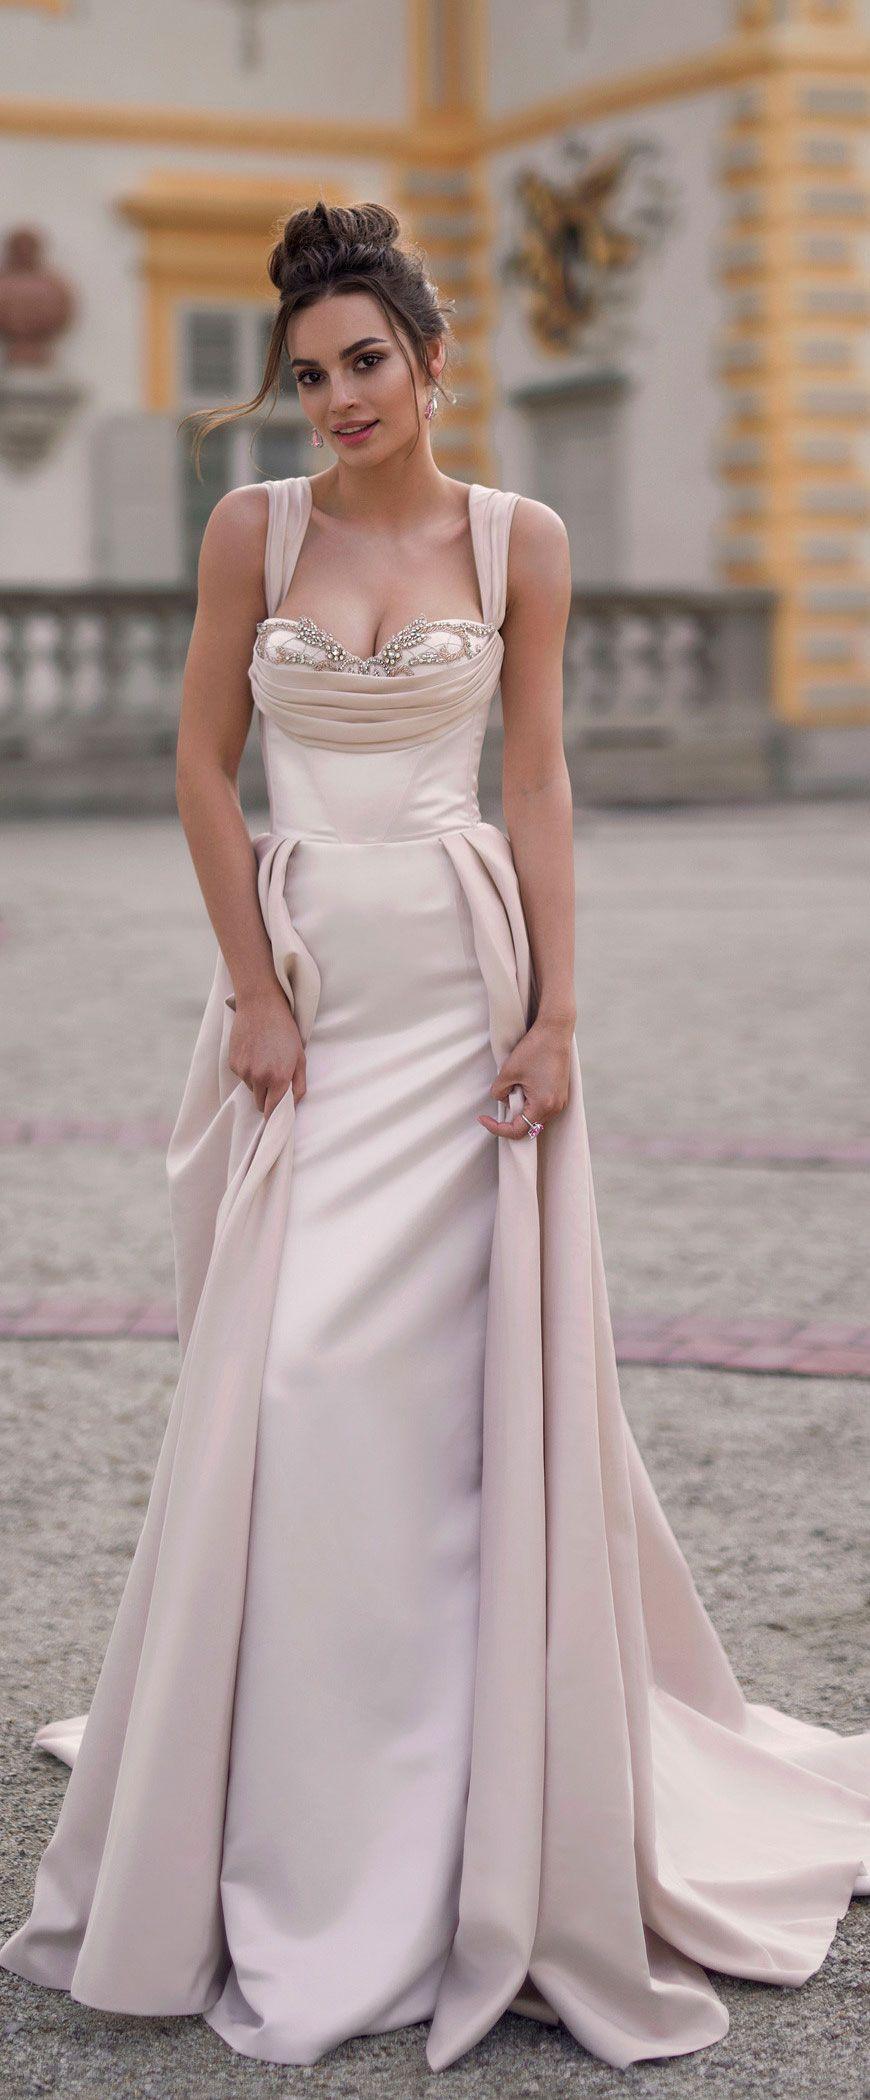 Alice in wonderland themed wedding dress  BLAMMOBIAMO  Wedding Dresses  Columns Neckline and Wedding dress